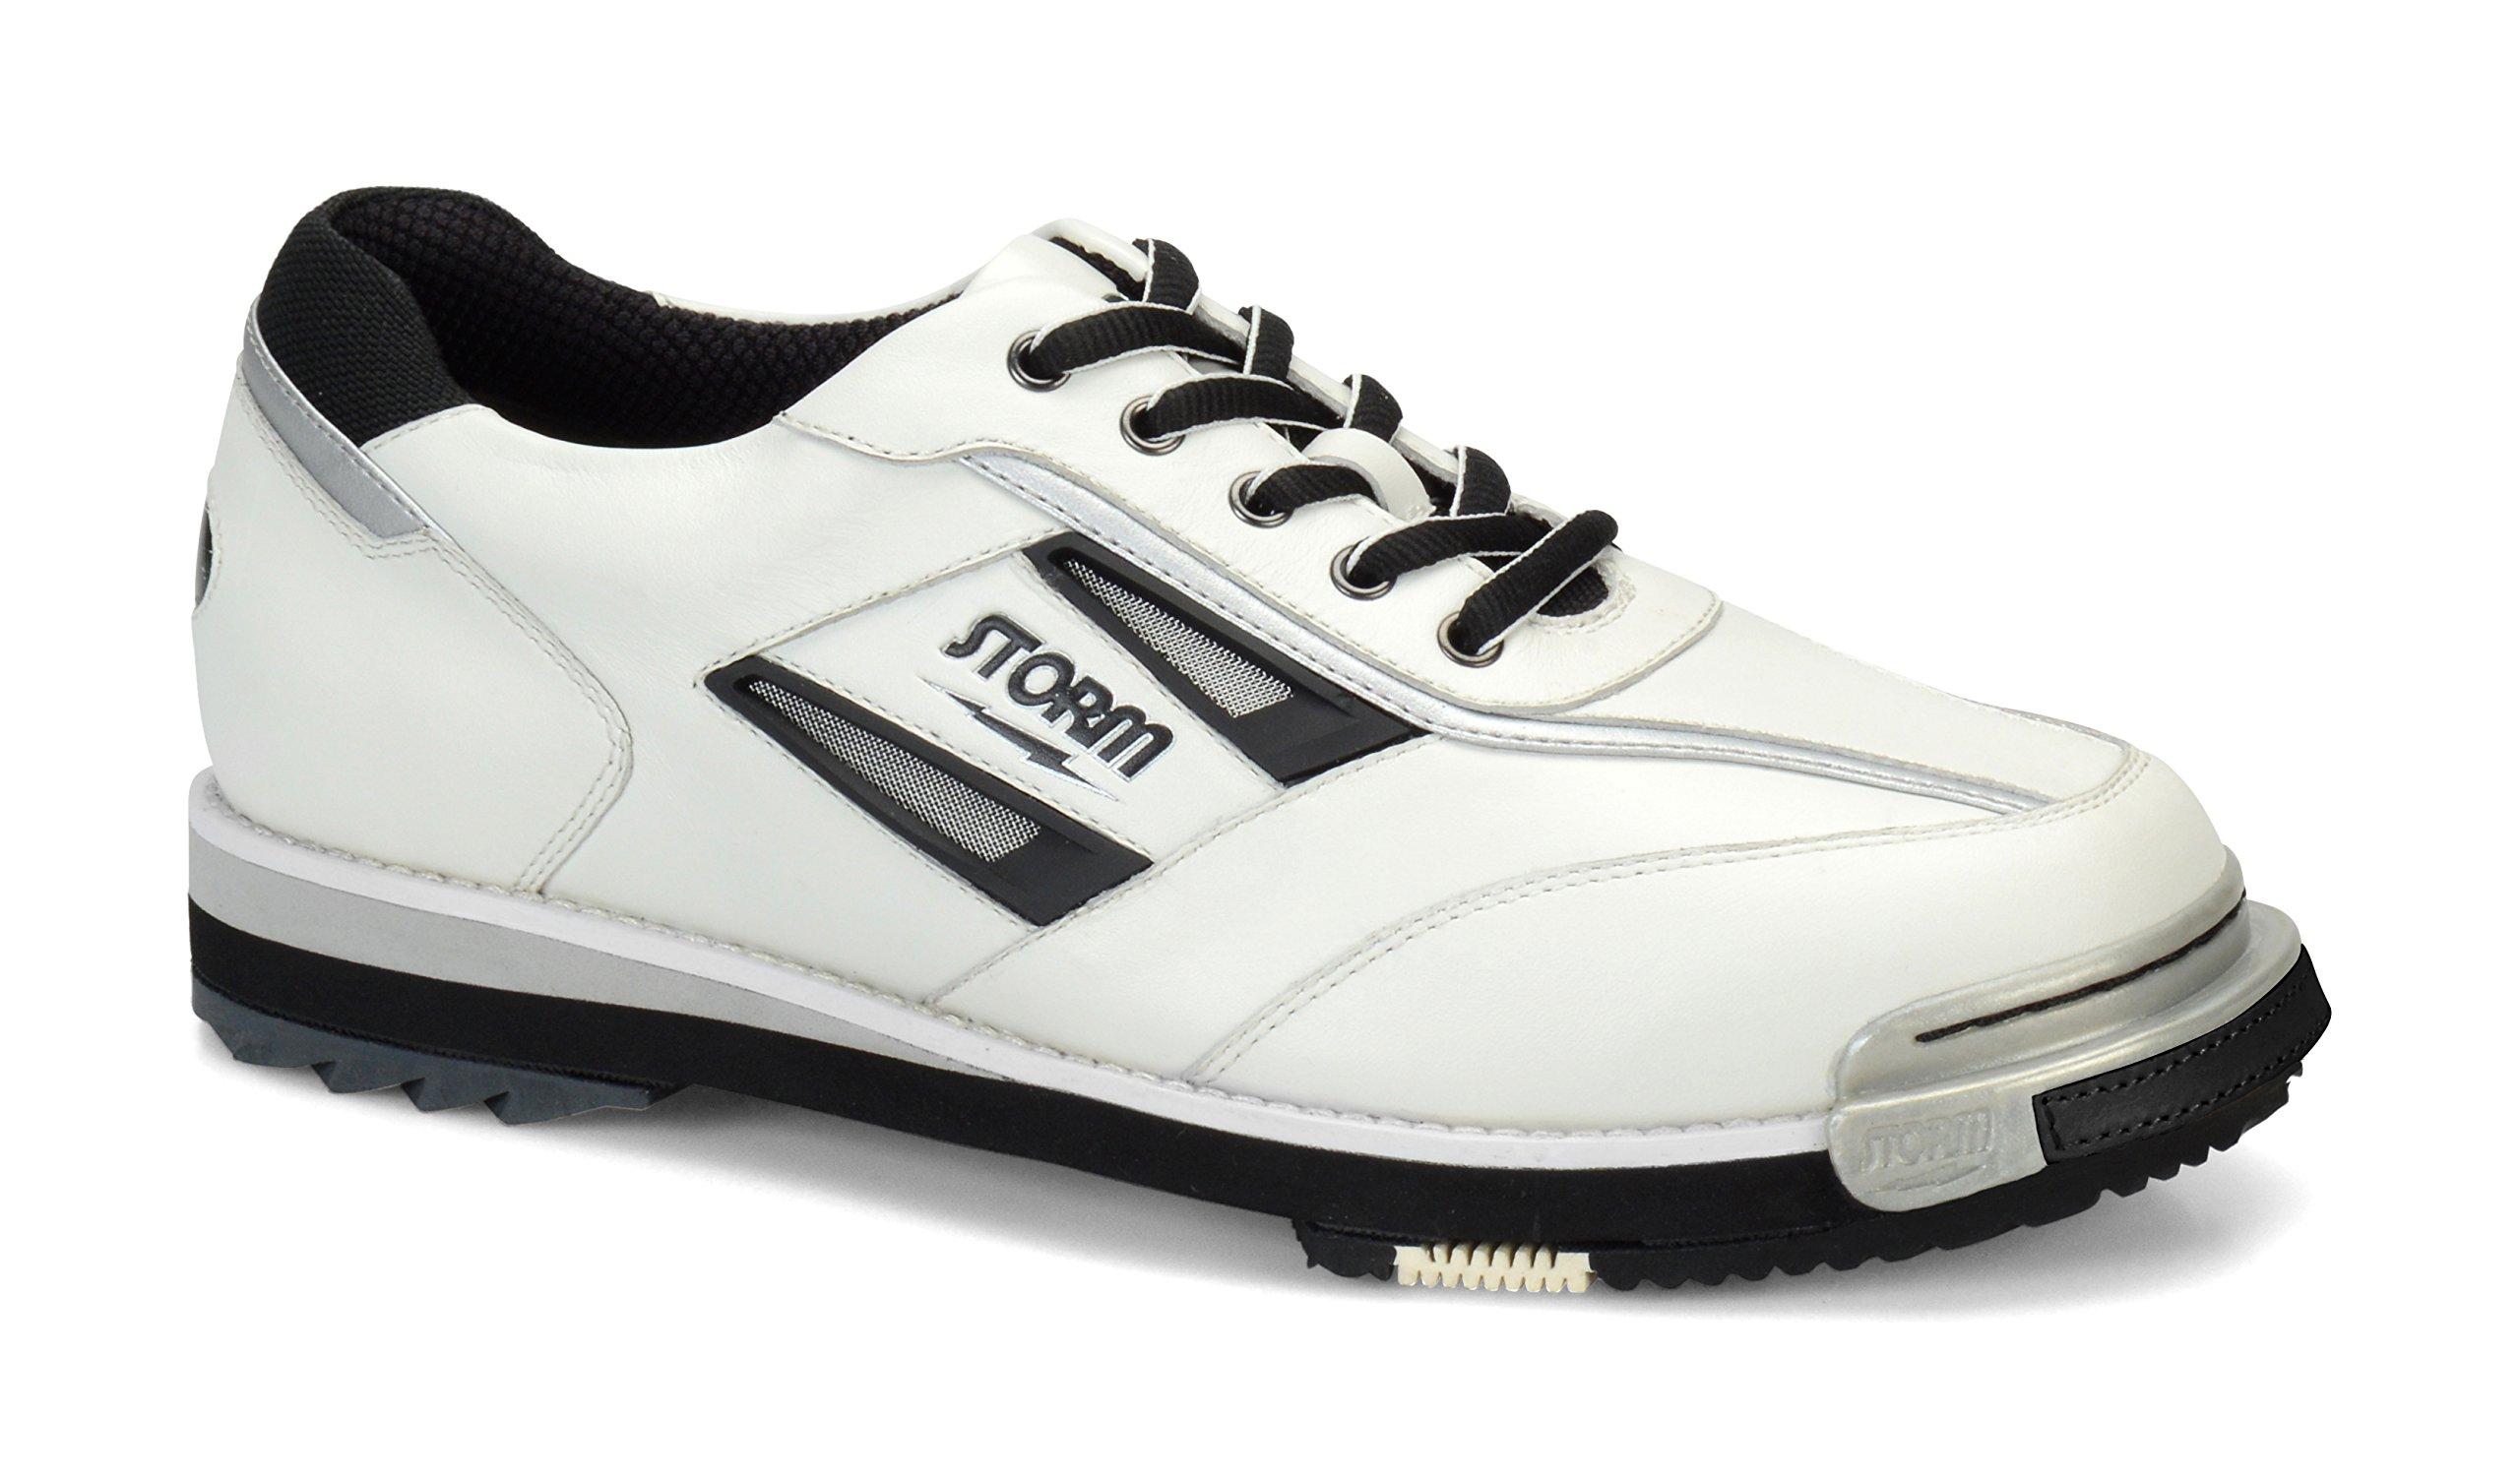 Storm SP2 901 Bowling Shoes, White/Black/Silver, 13.0